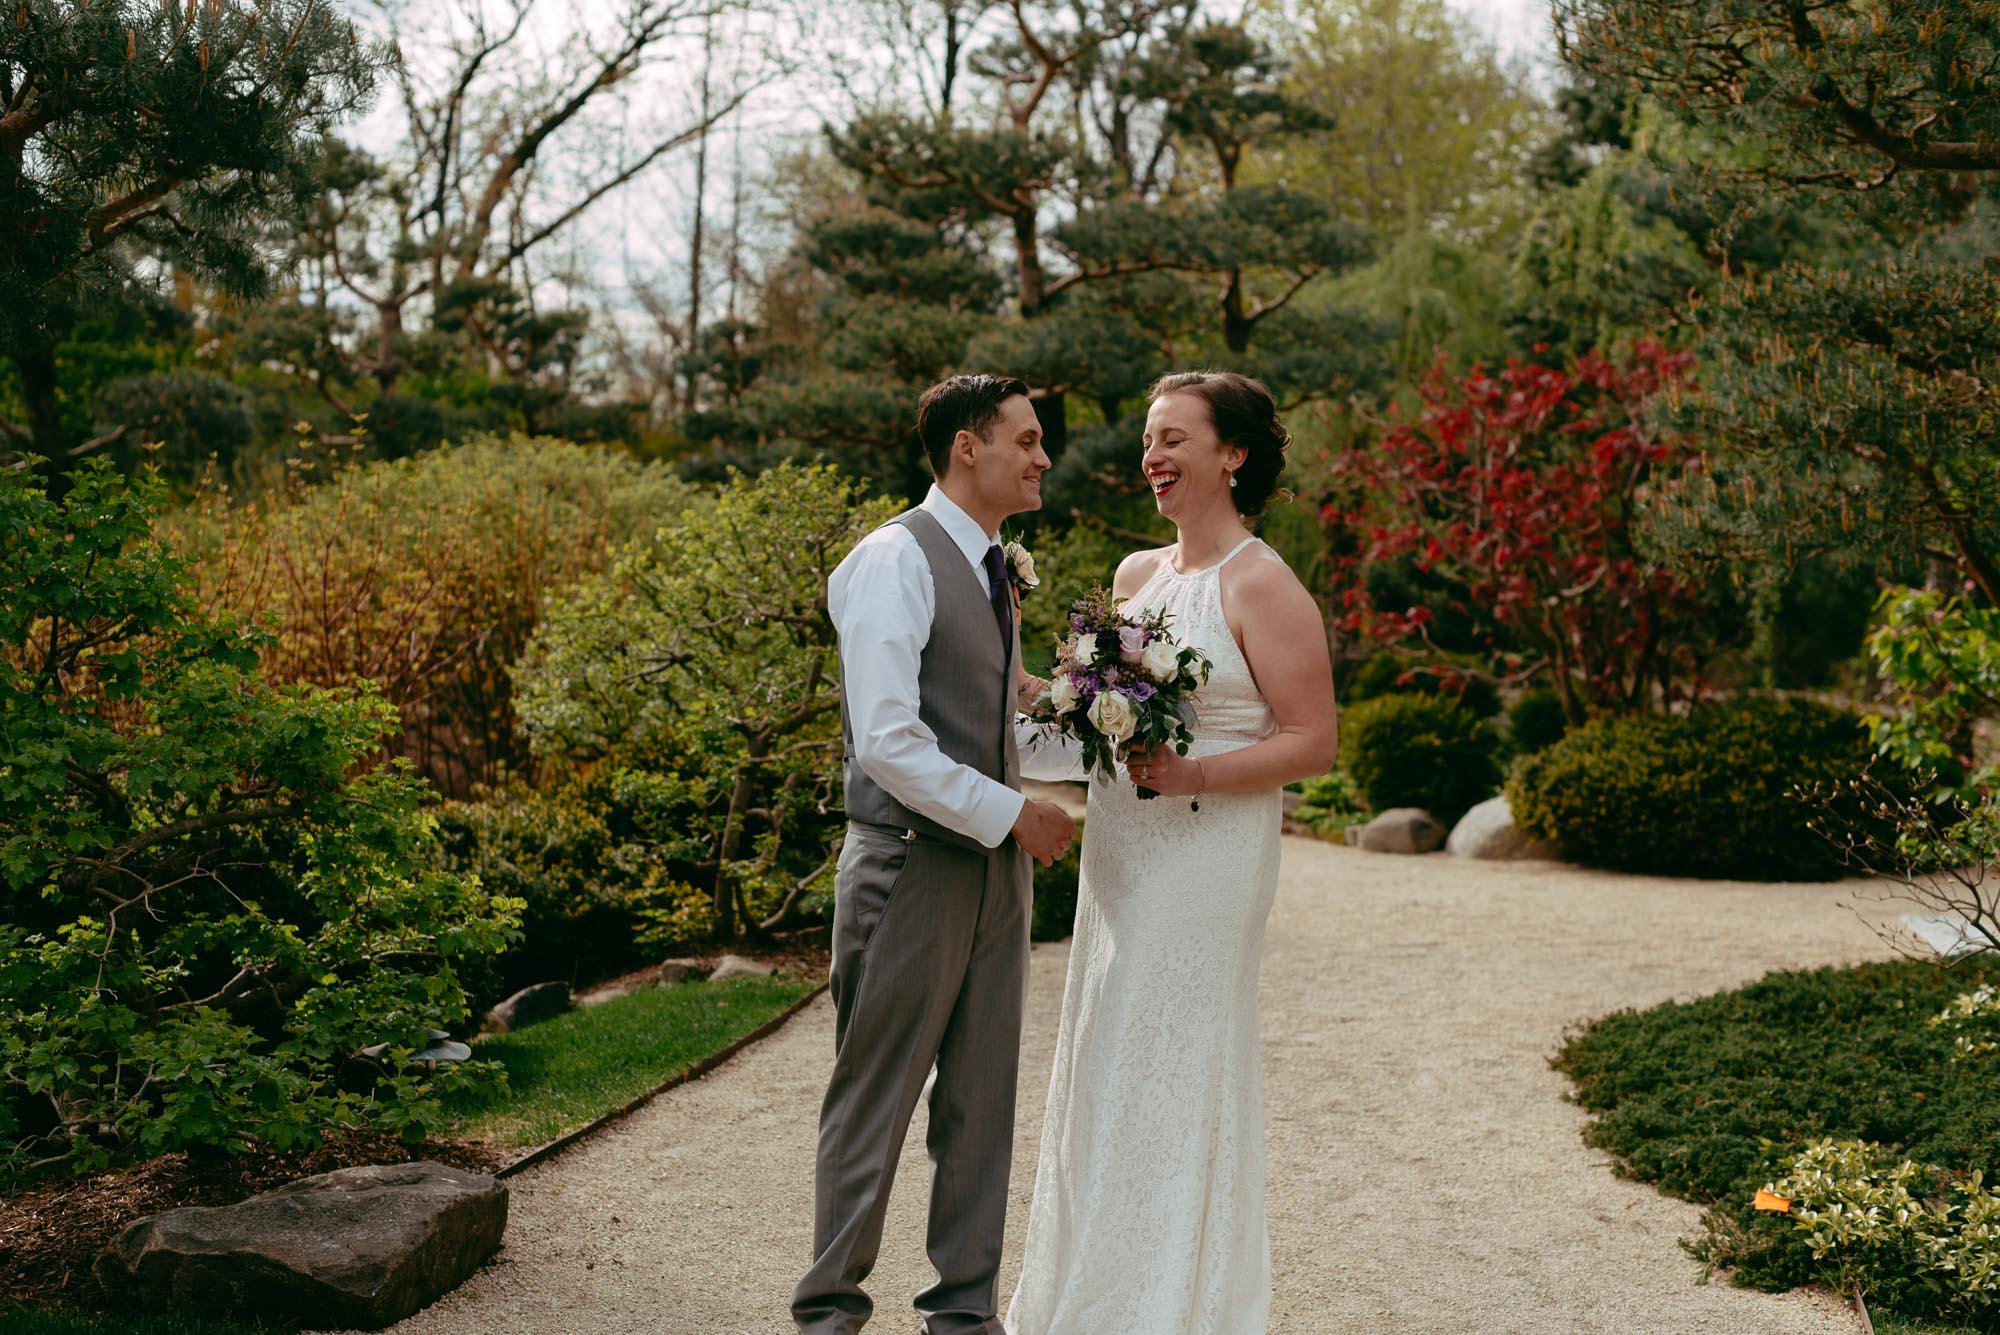 prairie-street-brewhouse-wedding-Rockford-IL-wedding-photographers-190.jpg